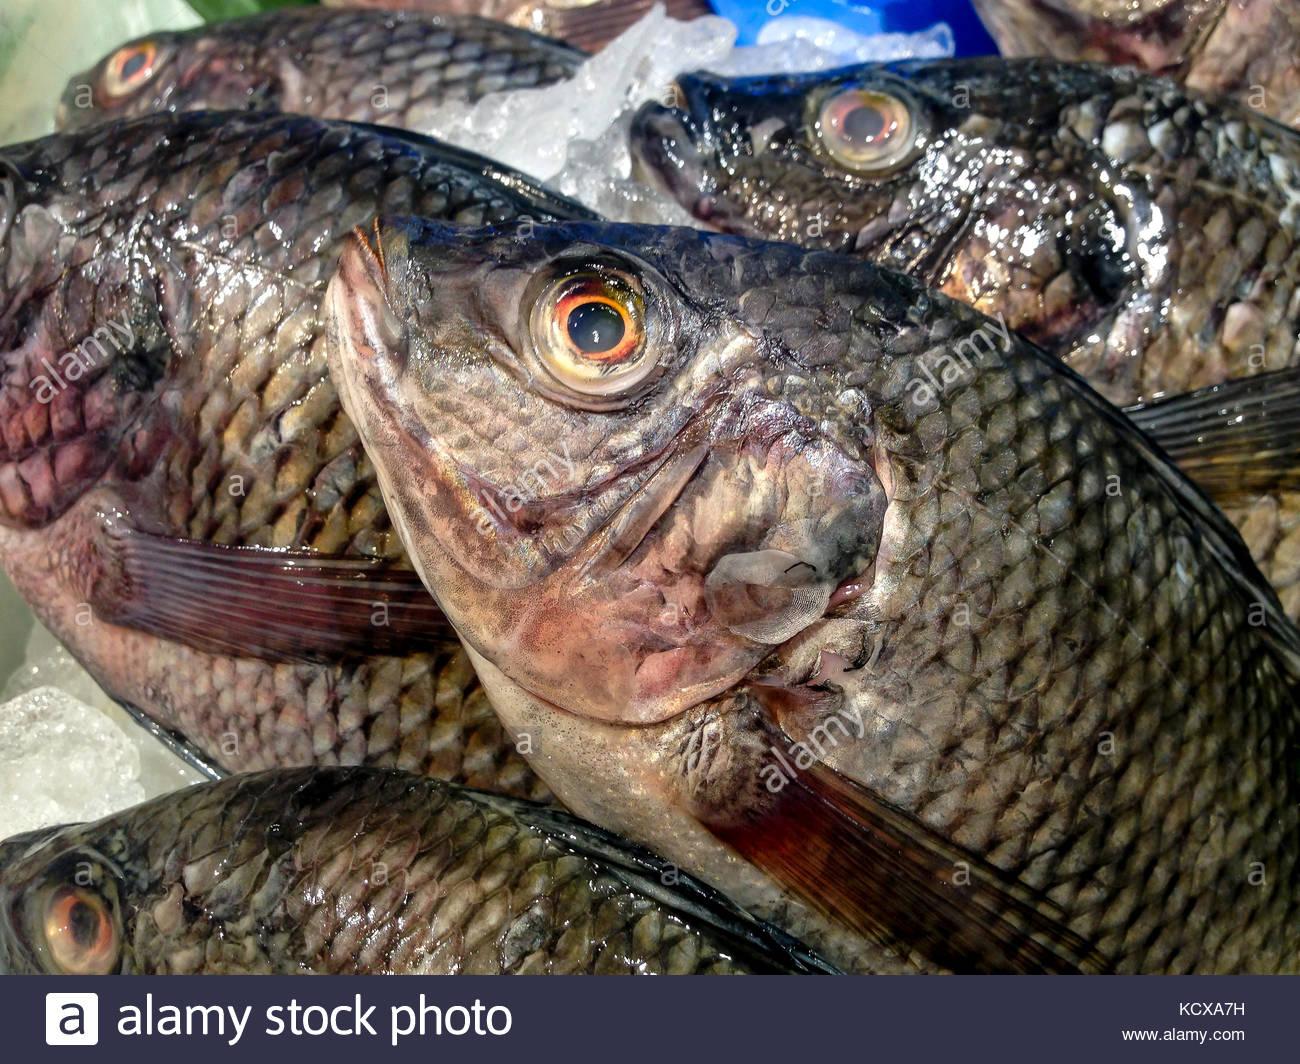 Fresh Fish on the Market - Stock Image